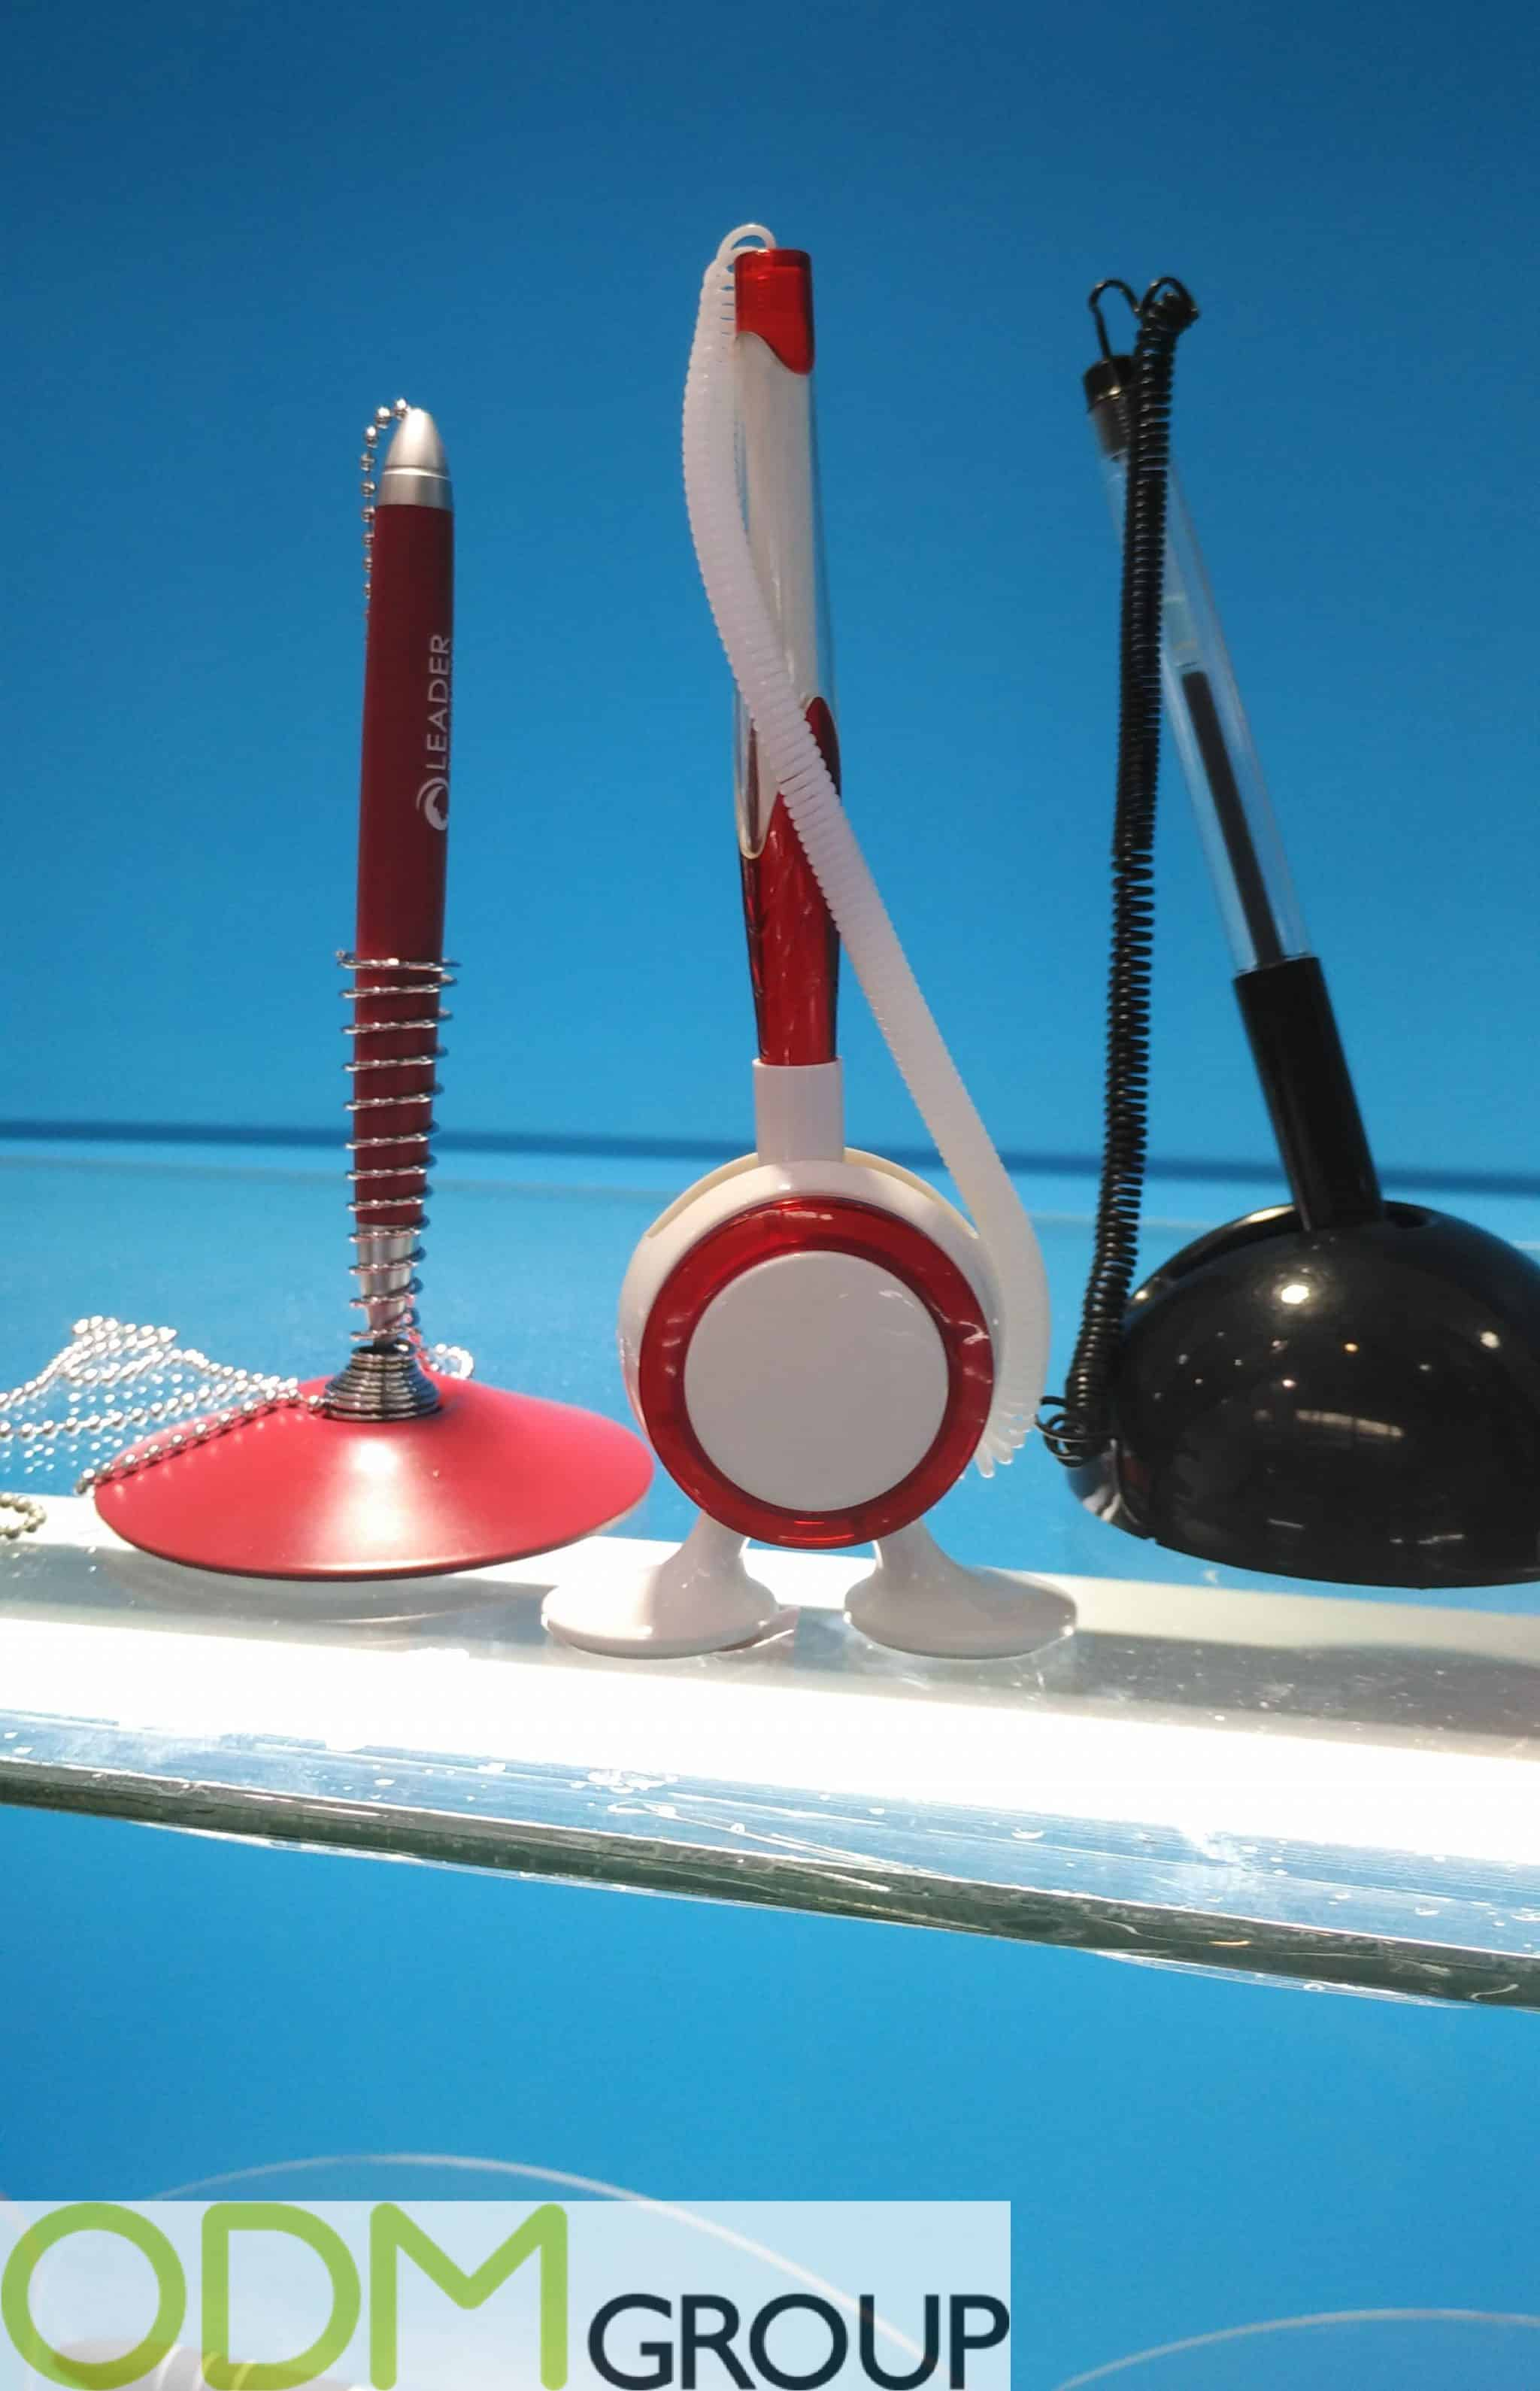 idea office supplies. Promotional Office Supplies Idea \u2013 Counter Top Pen Holders   TheODMGroup Blog S